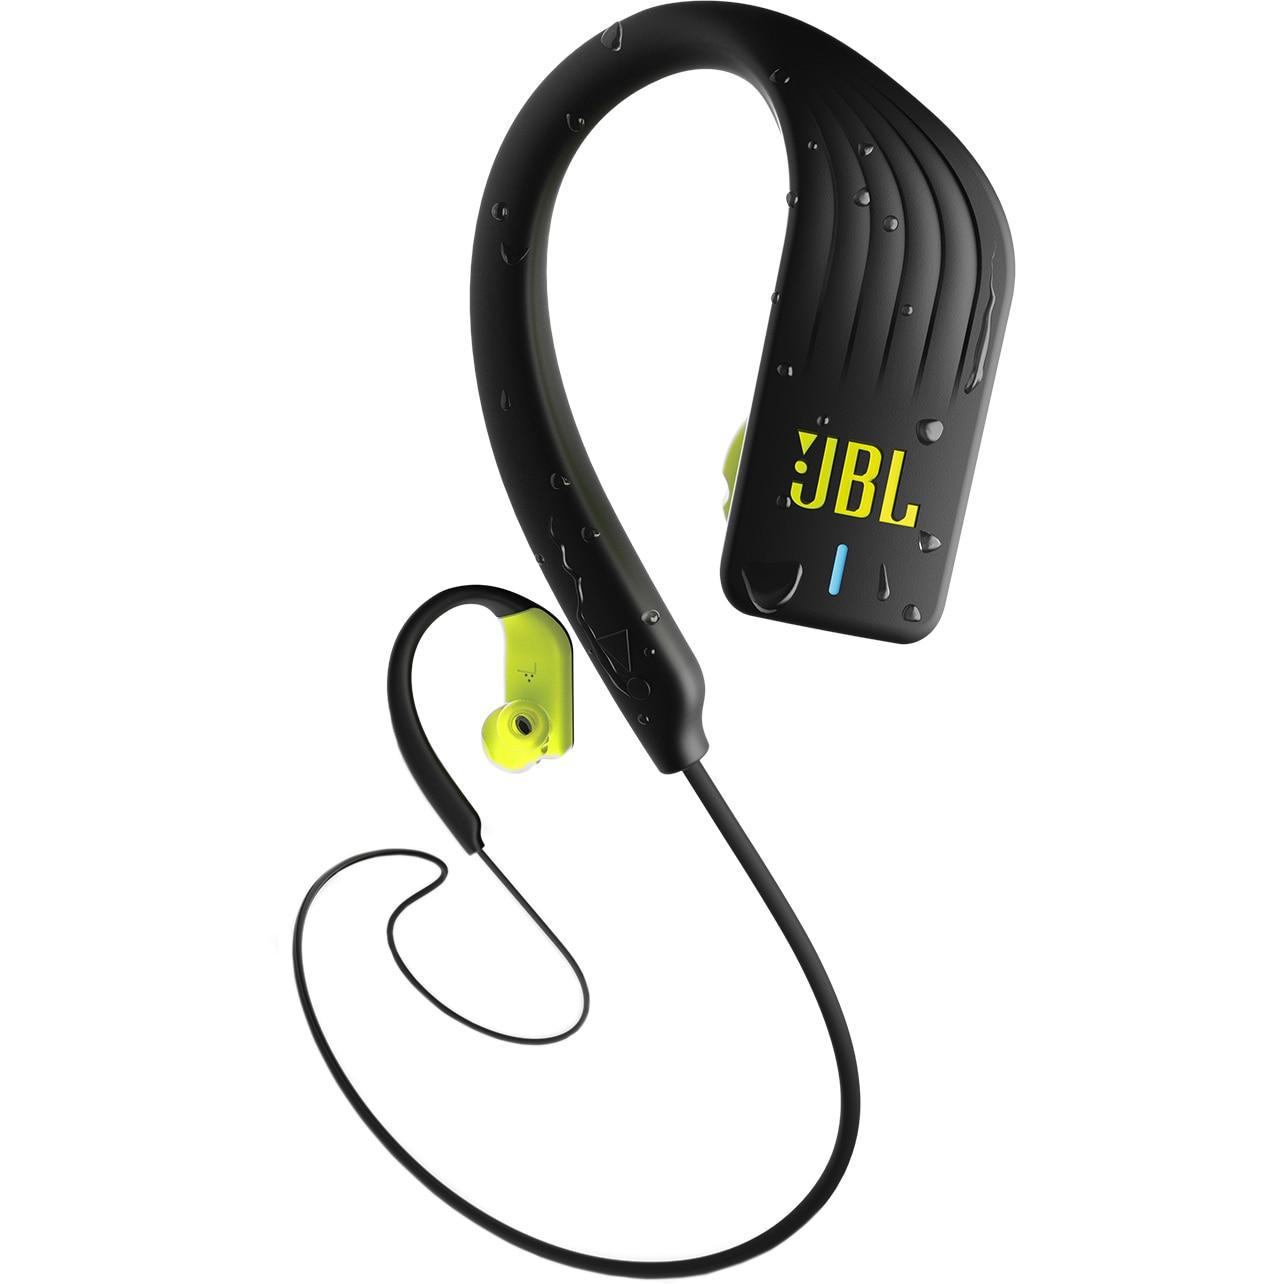 Fotografie Casti Audio sport In Ear JBL Endurance Sprint, Wireless, Bluetooth, Autonomie 8 ore, Verde